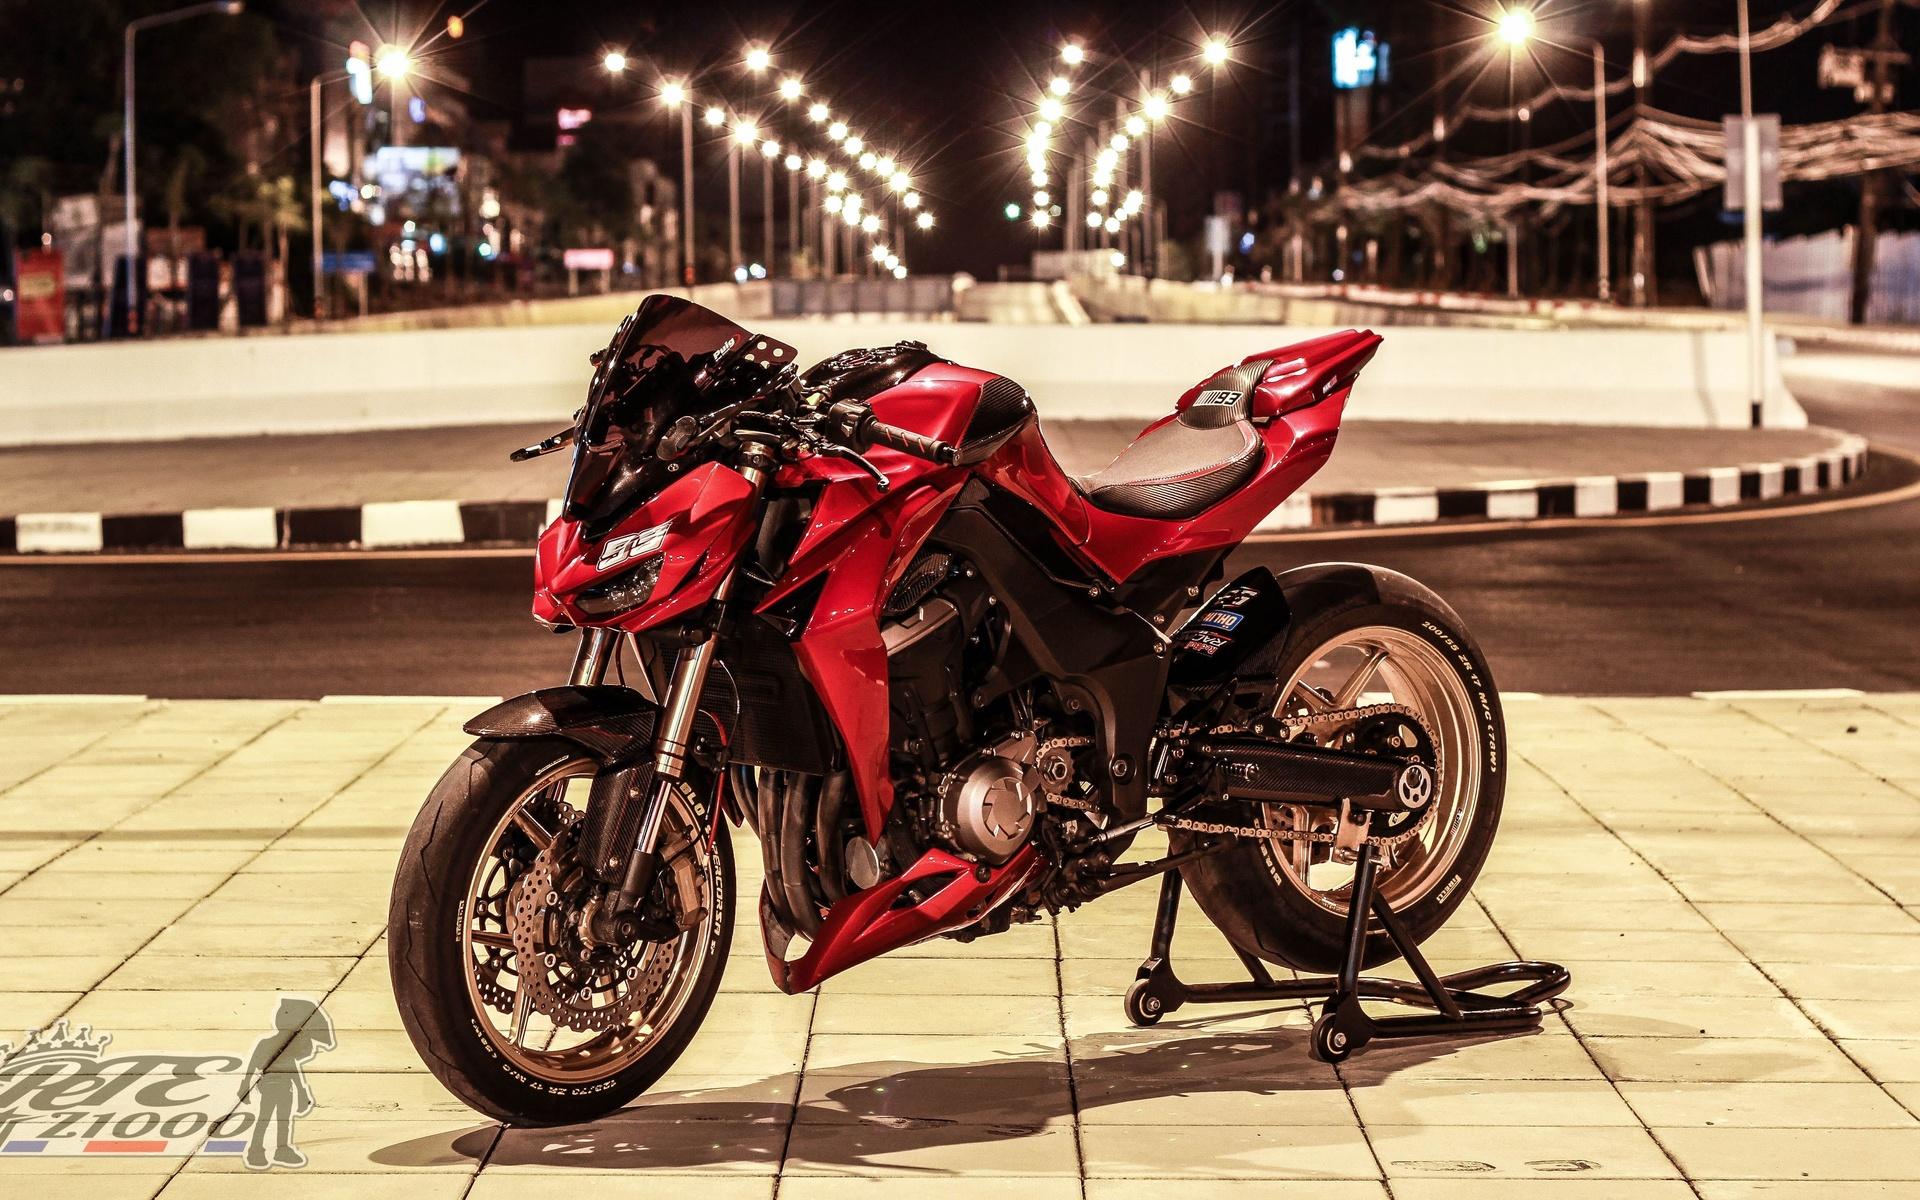 710, best, kawasaki, z1000, images in, 2020, motorcycle, motorbikes